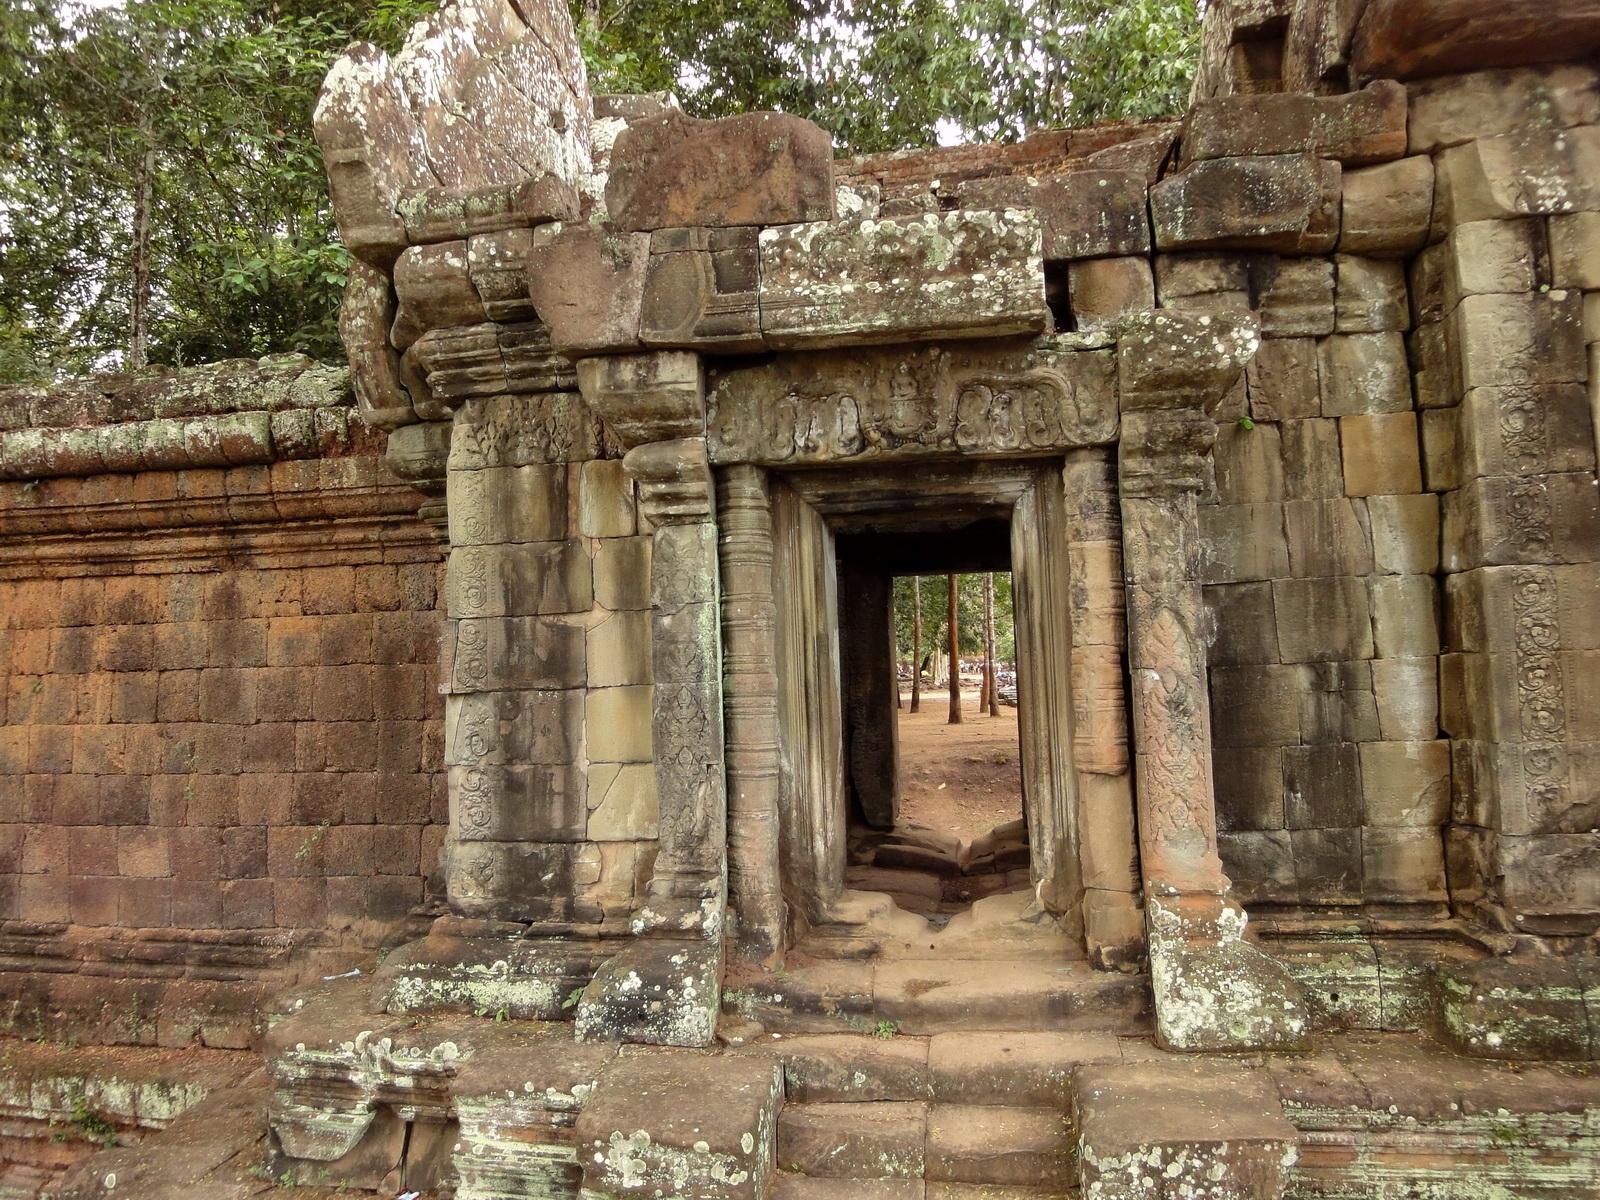 Terrace of the Elephants inner gate Angkor Thom 02